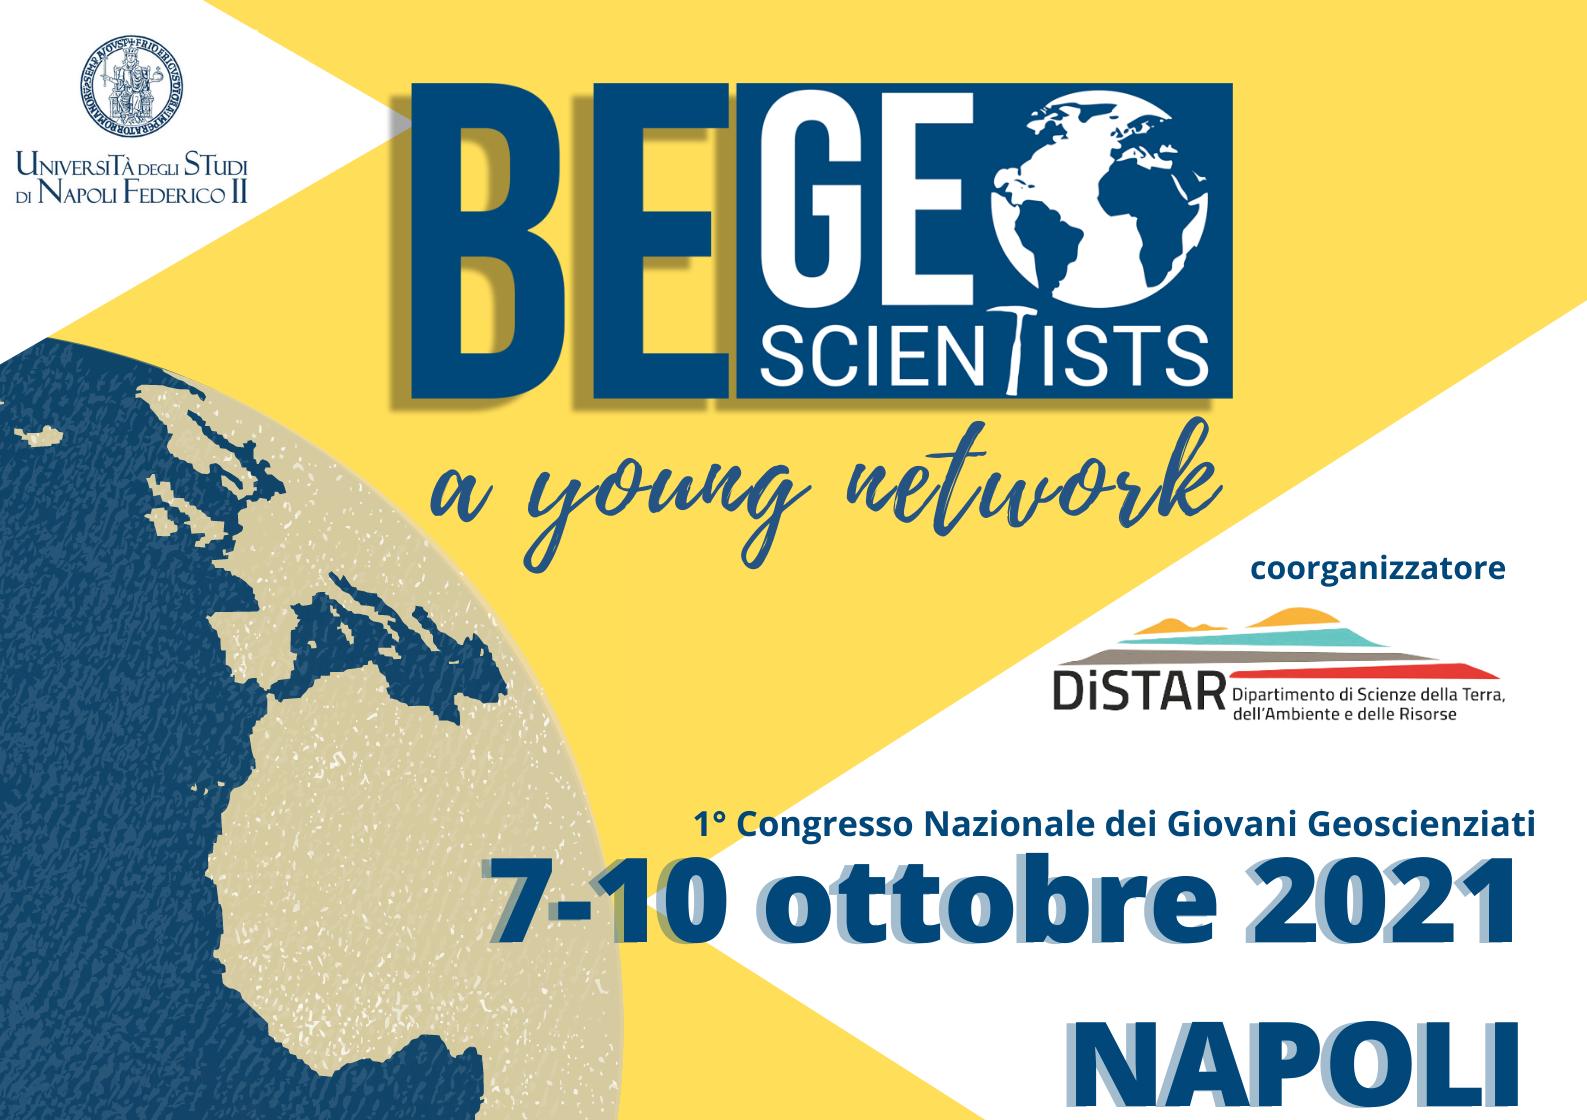 Congresso: BeGEO 2021, 7-10 ottobre 2021